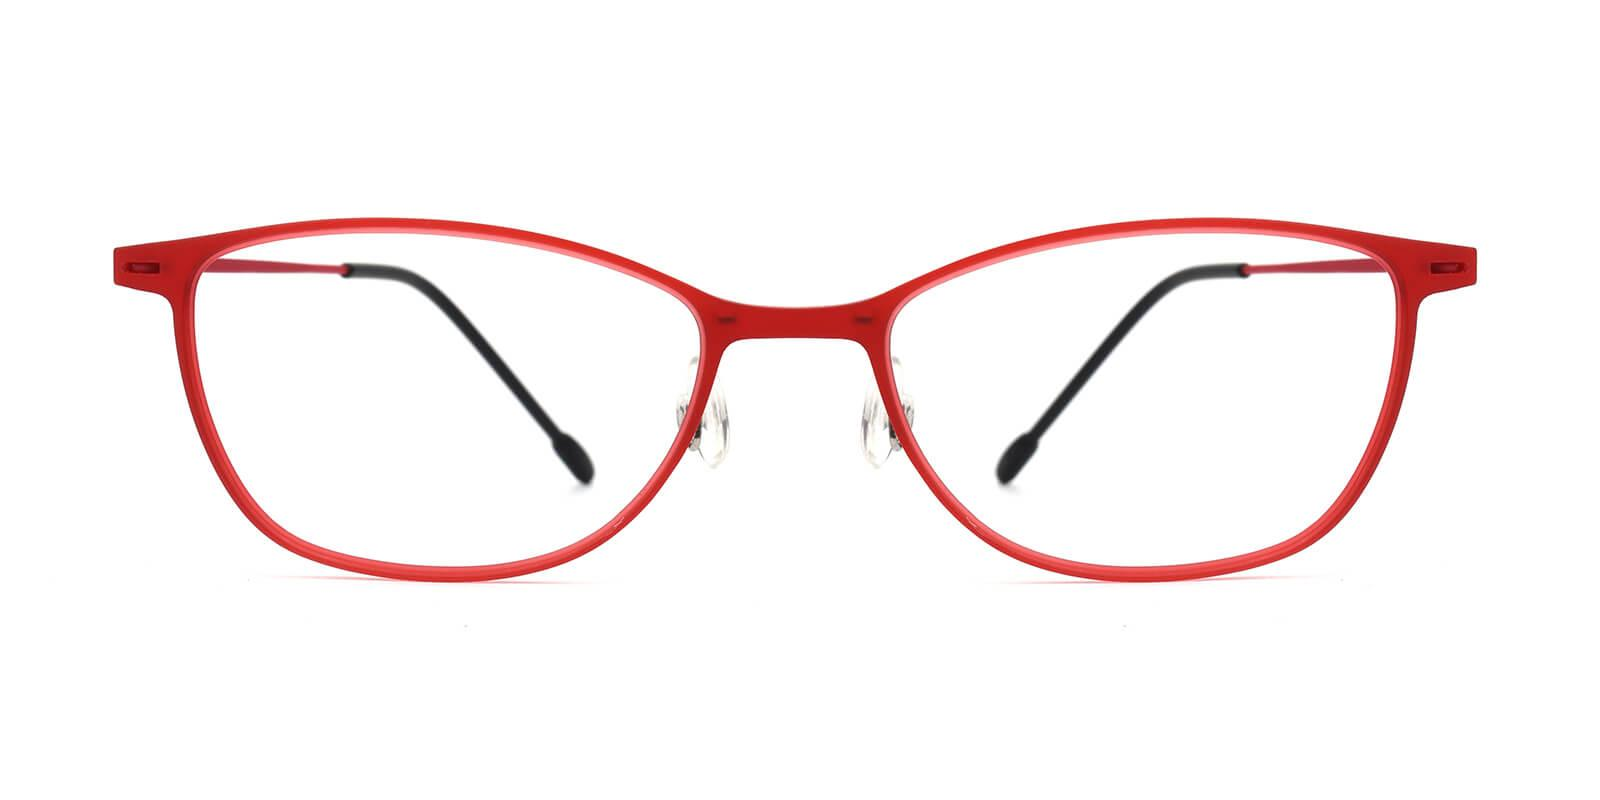 Pridgen-Red-Rectangle / Cat-Combination-Eyeglasses-additional2